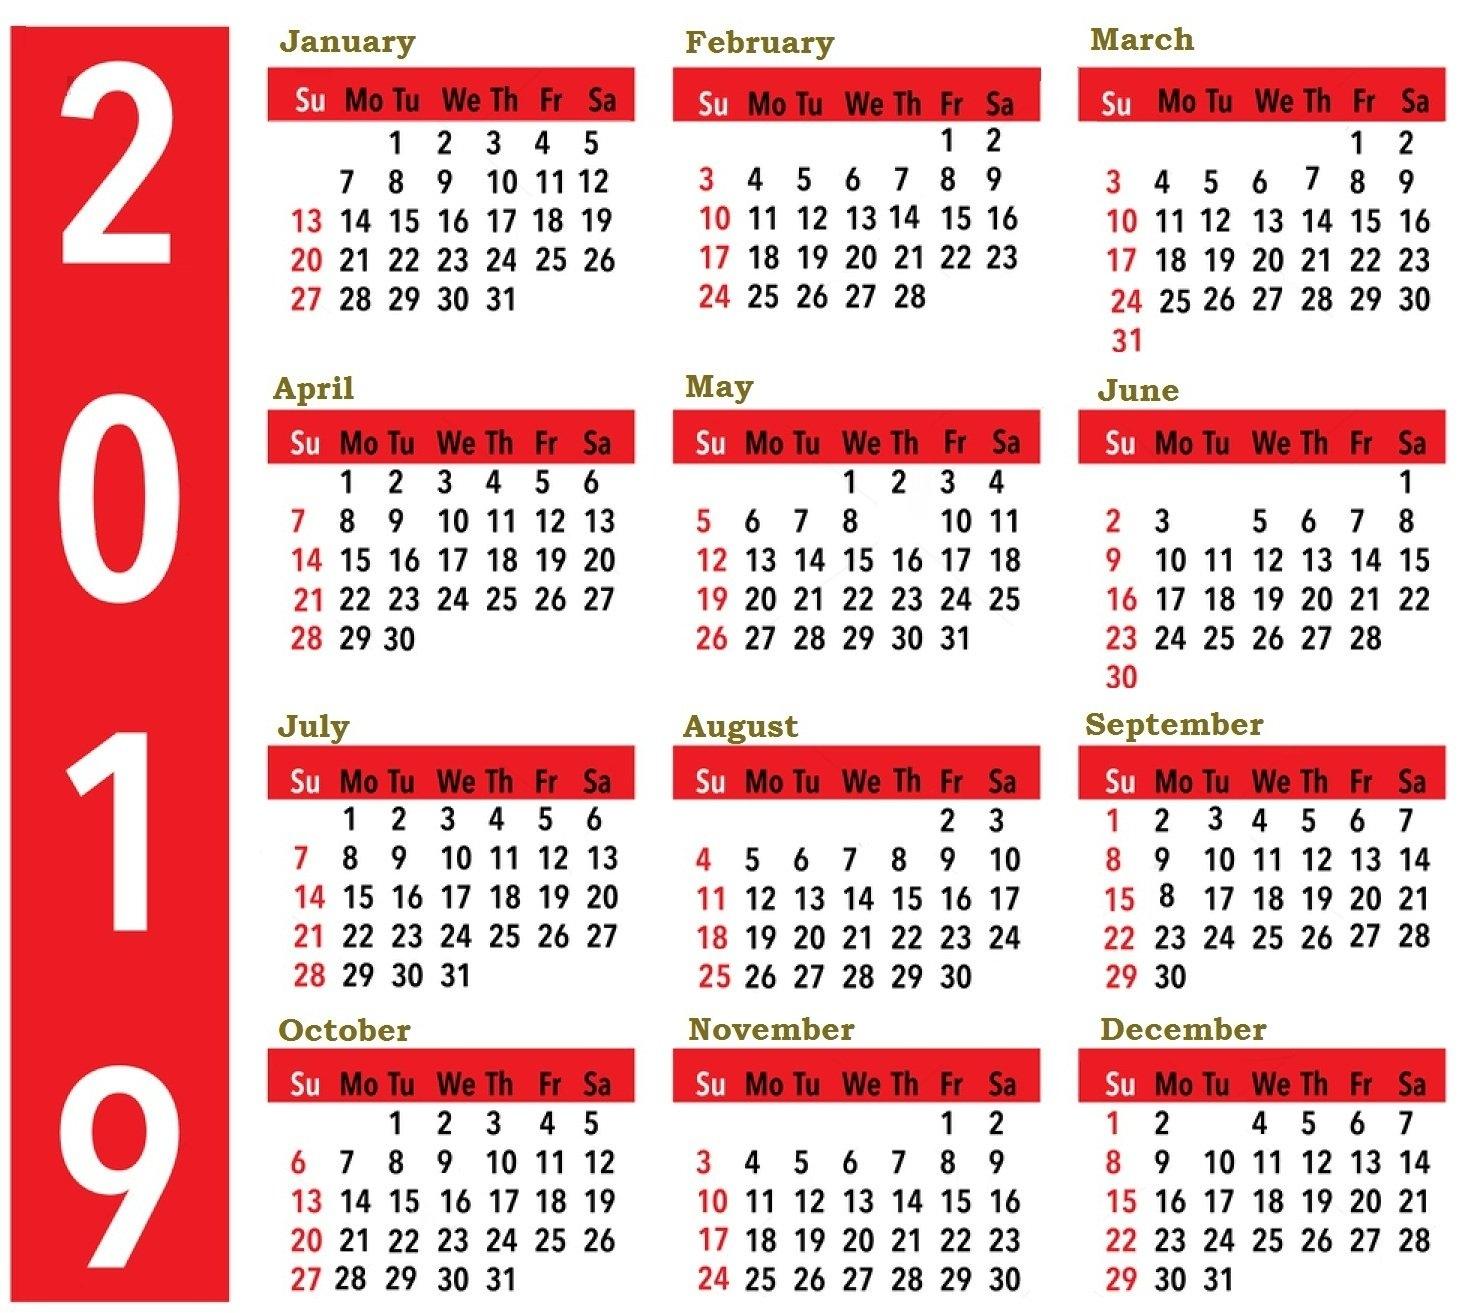 2019 Calendar Large Print – Free Calendar Templates & Worksheets For Calendar 2019 Large Print